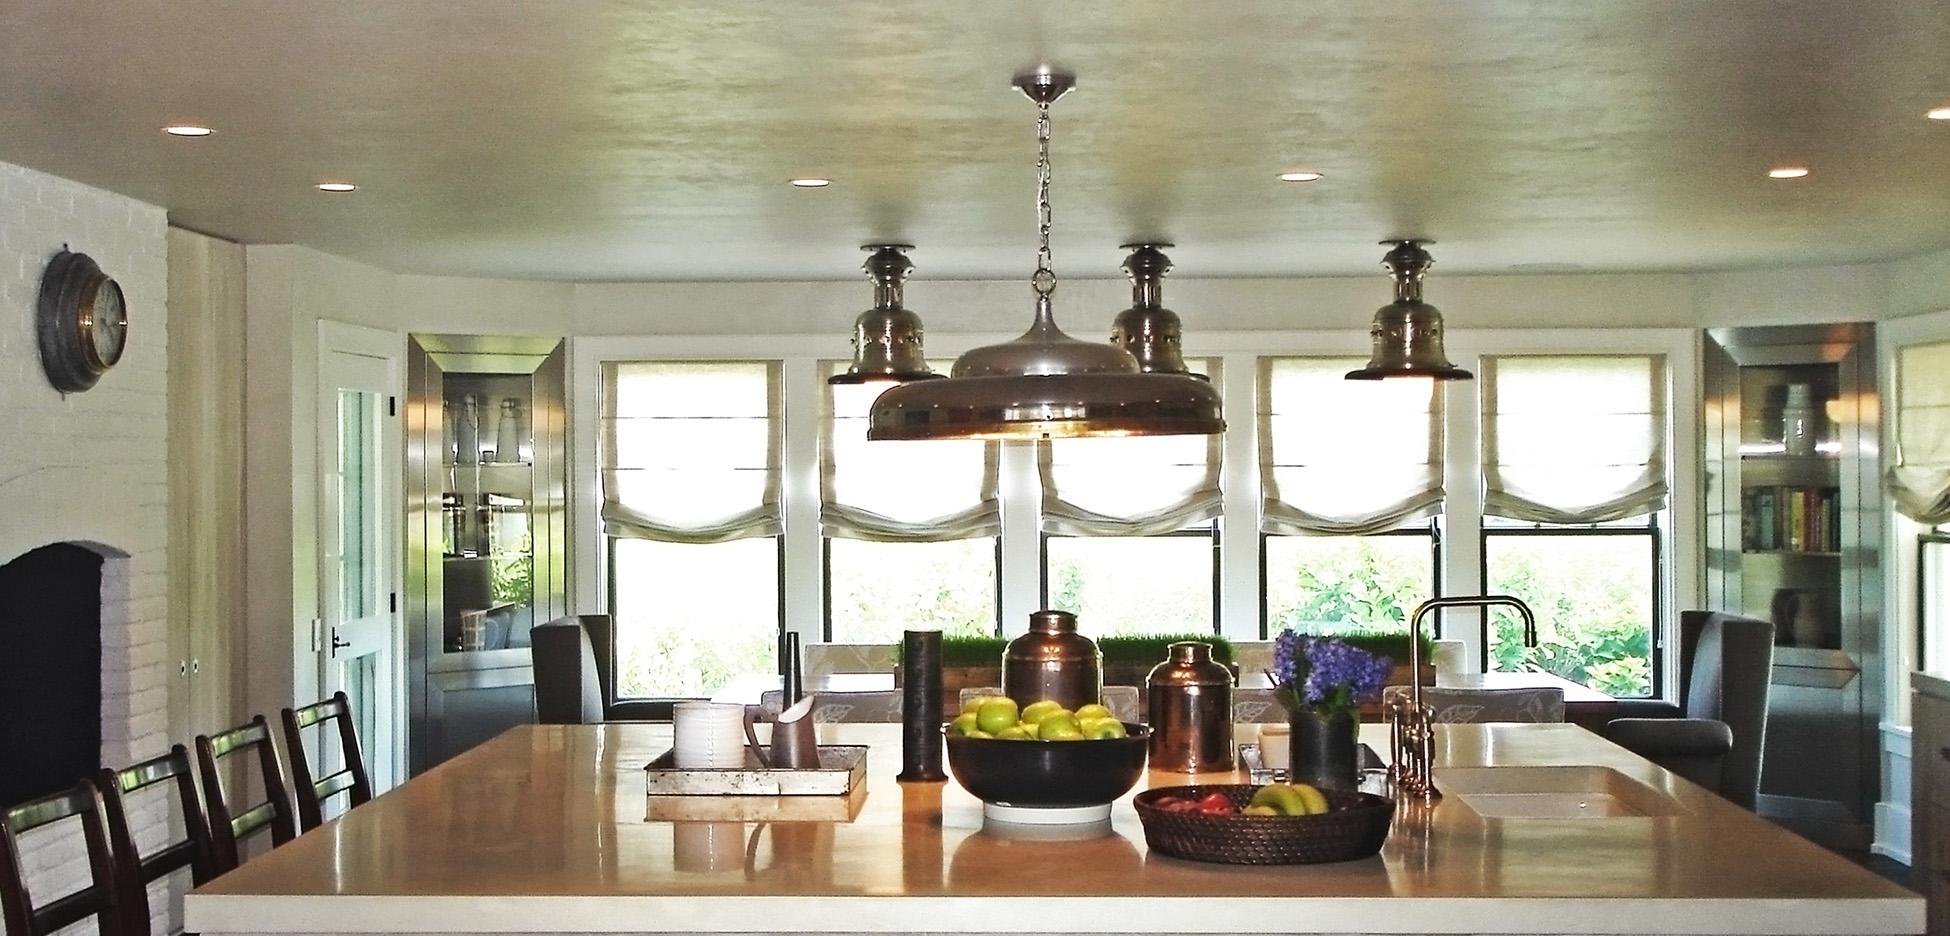 BOK-Architect-Hamptons-12a copy